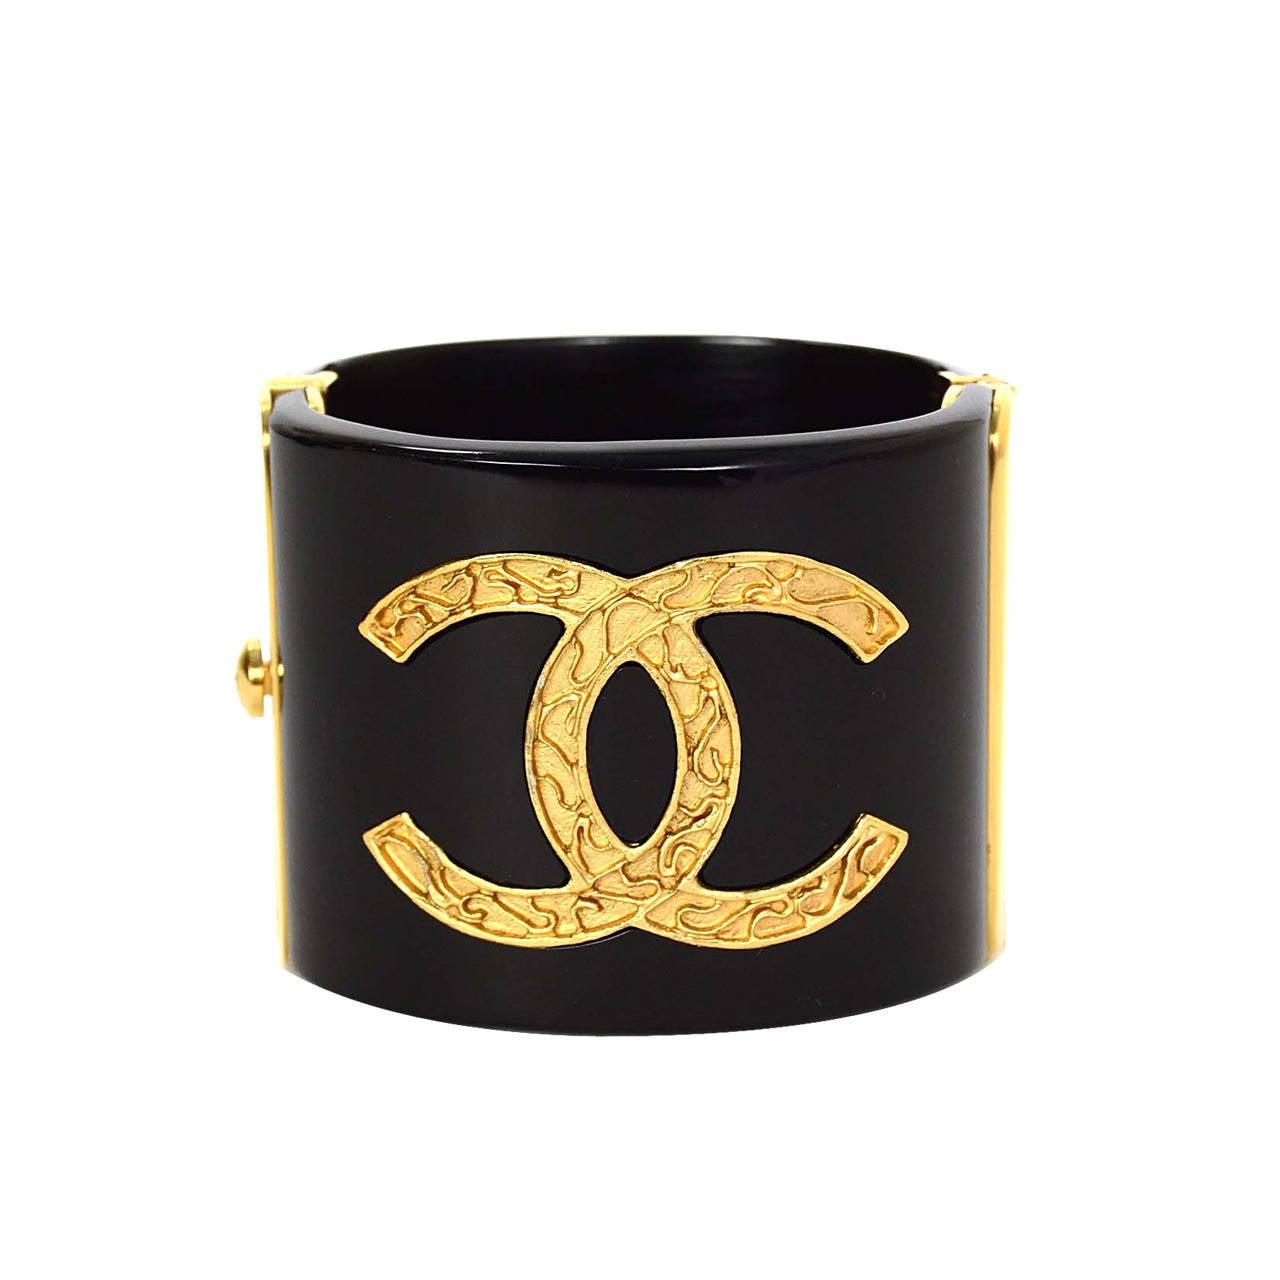 CHANEL Black Resin & Goldtone Cuff Bracelet 1